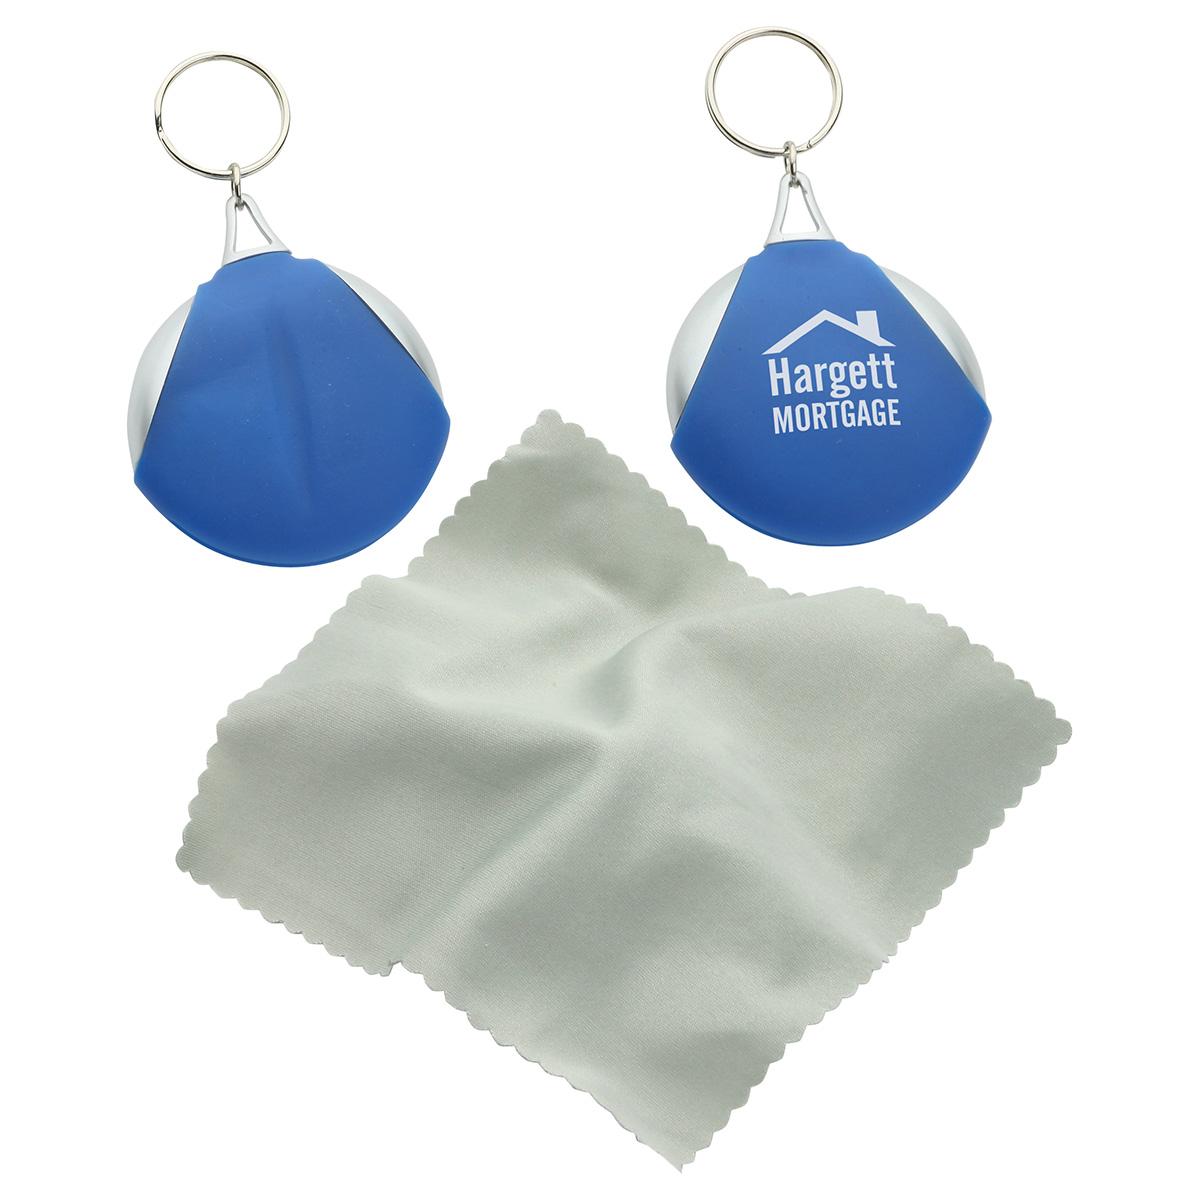 Pocket Microfiber Lens Cloth Keychain, WEE-PC11 - 1 Colour Imprint